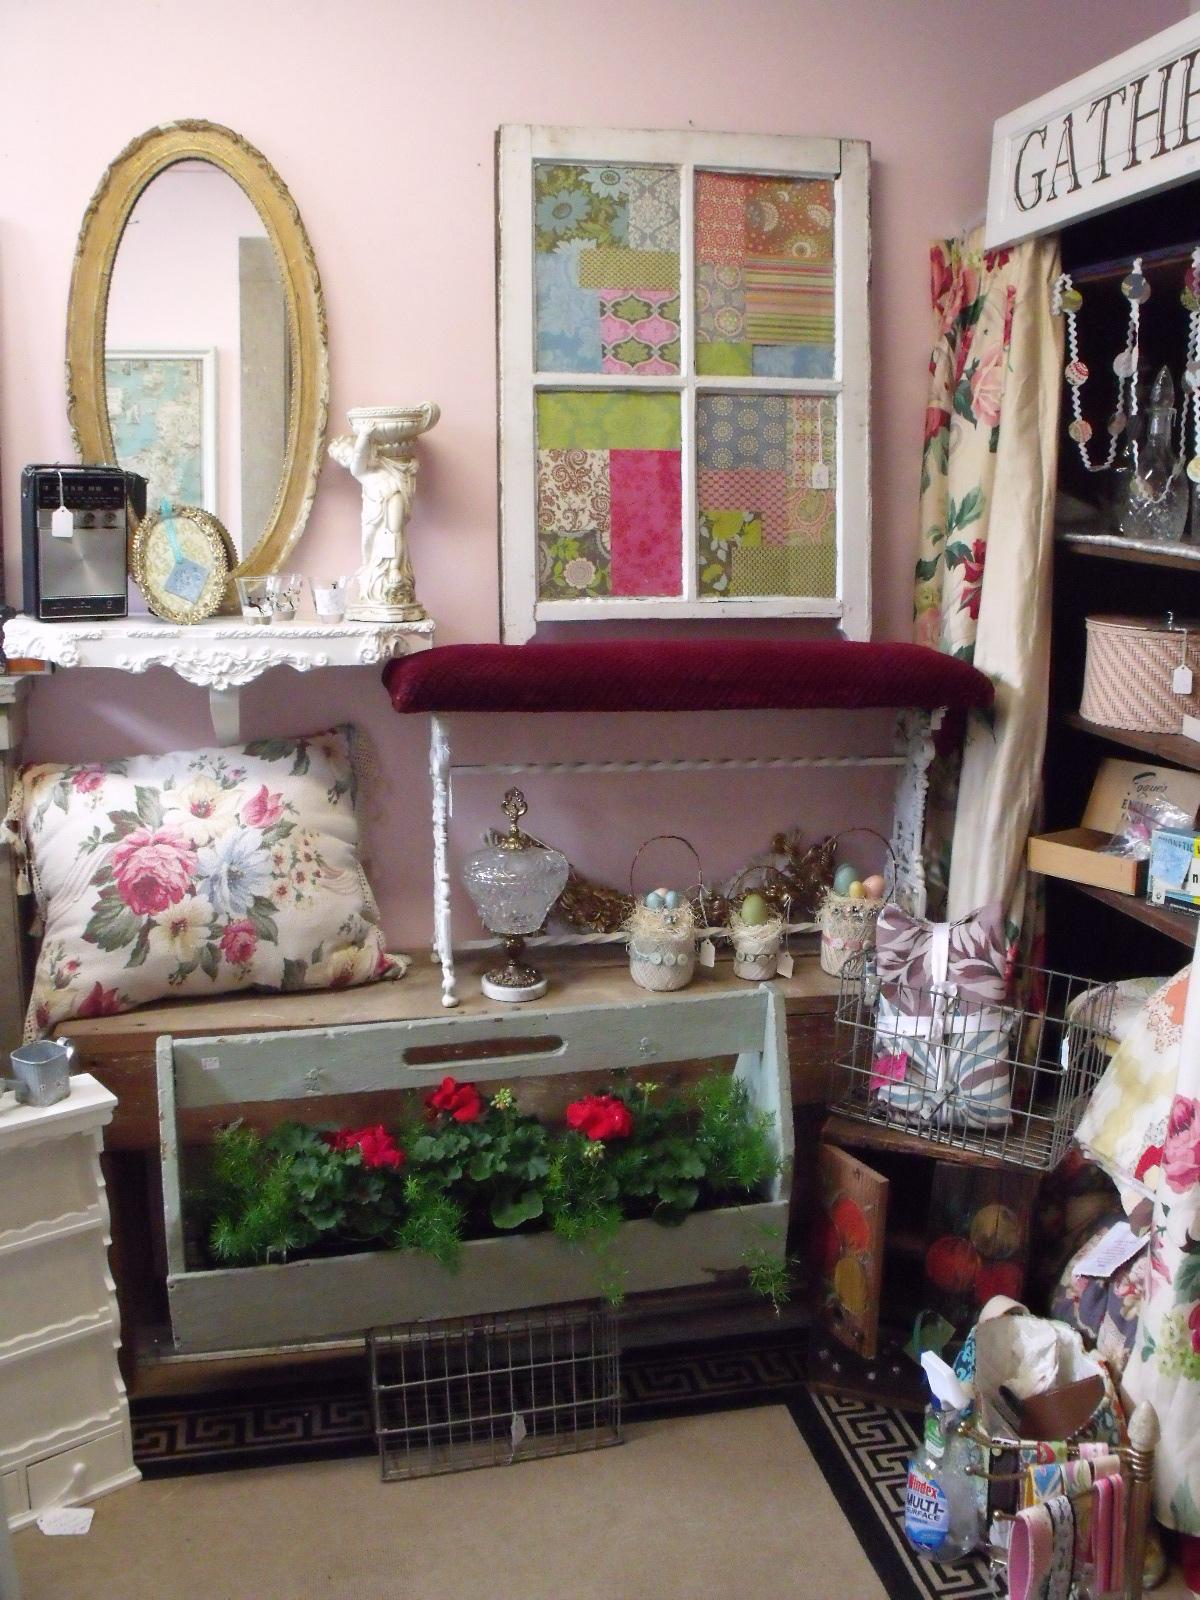 Milford Kitchen And Bath Fenton